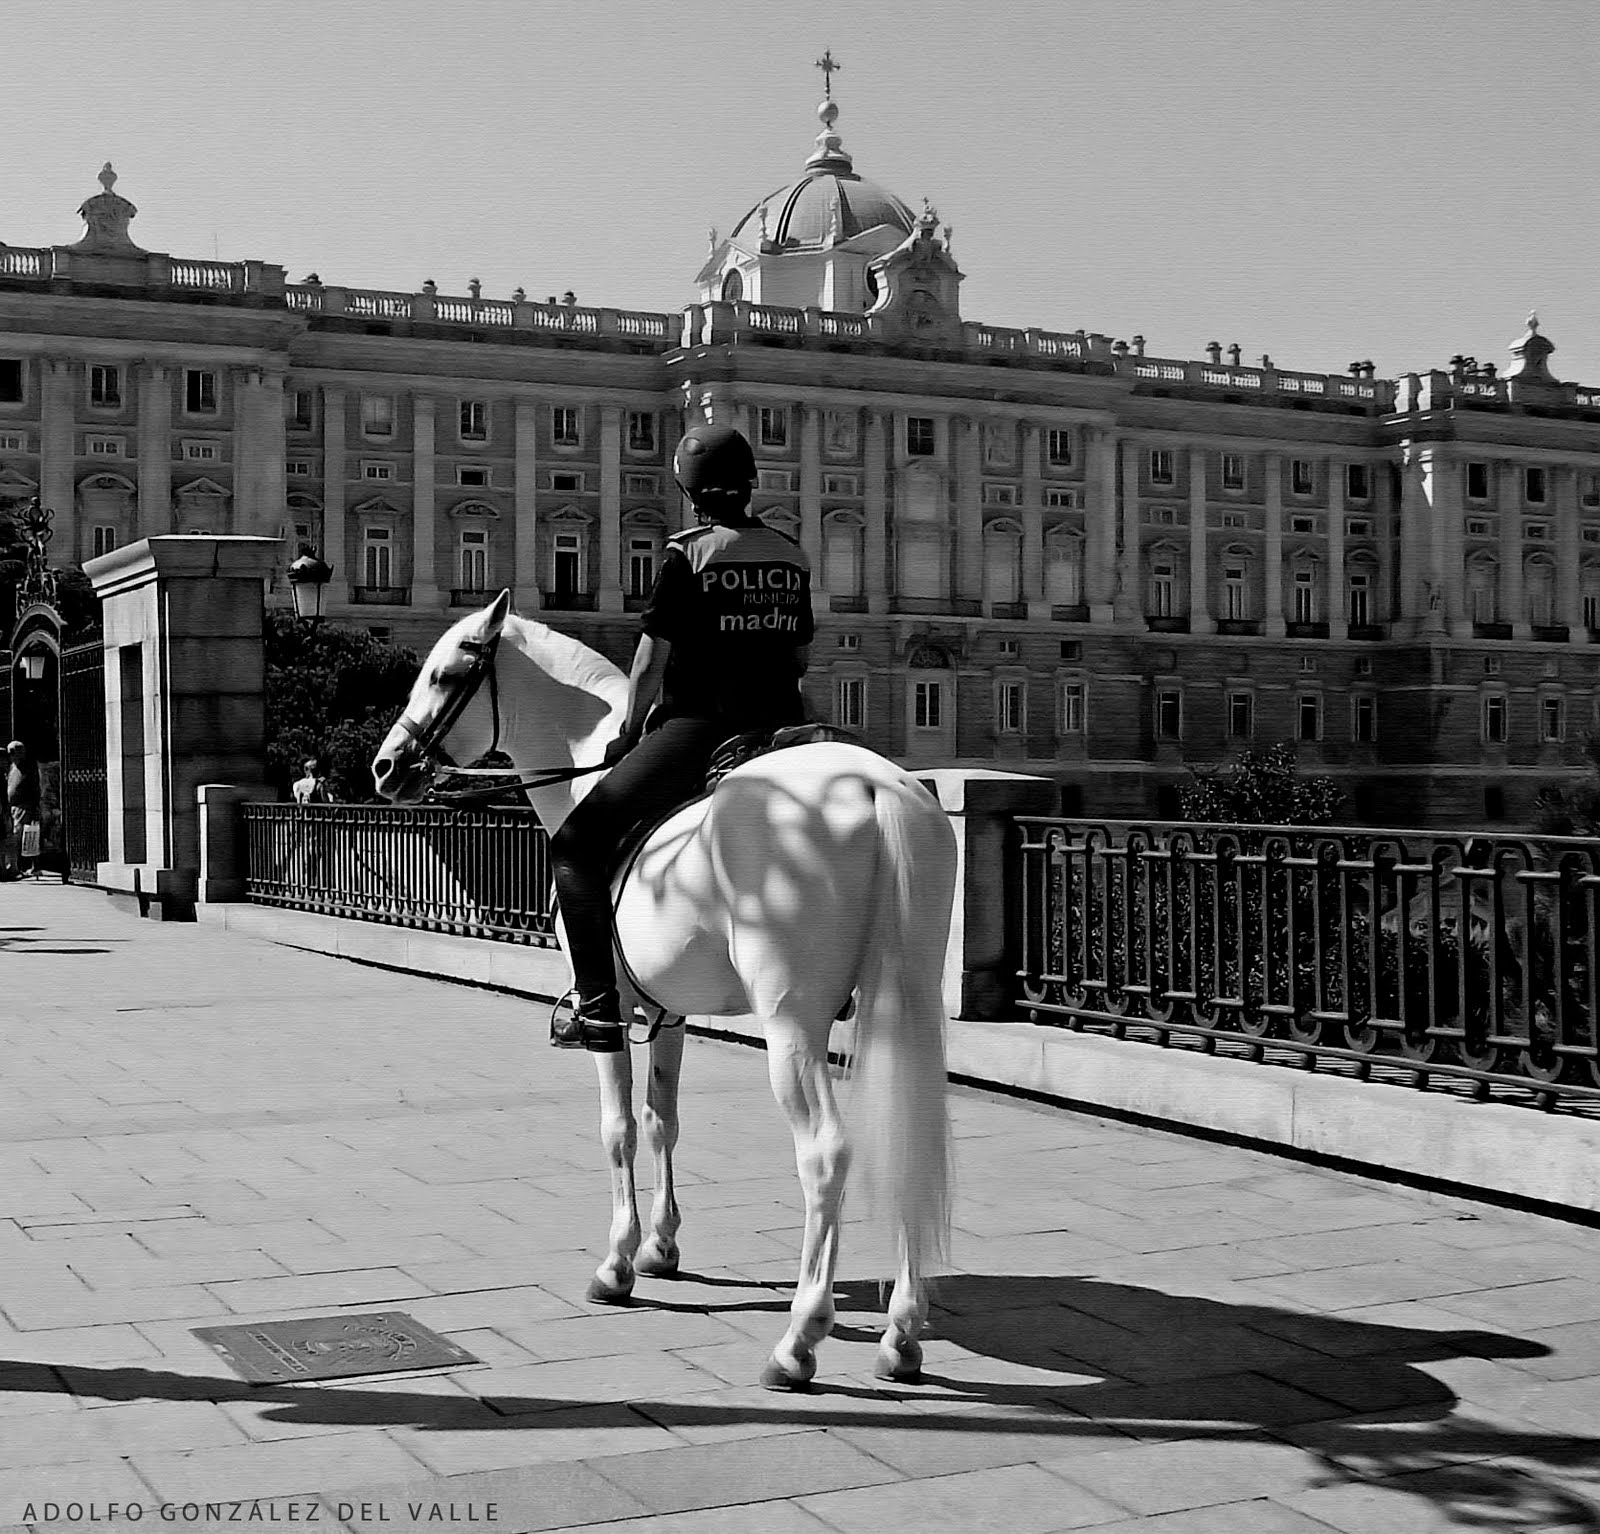 Caballos Follando Con Mujeres Porno Gratis ver viejas cogiendo con caballos